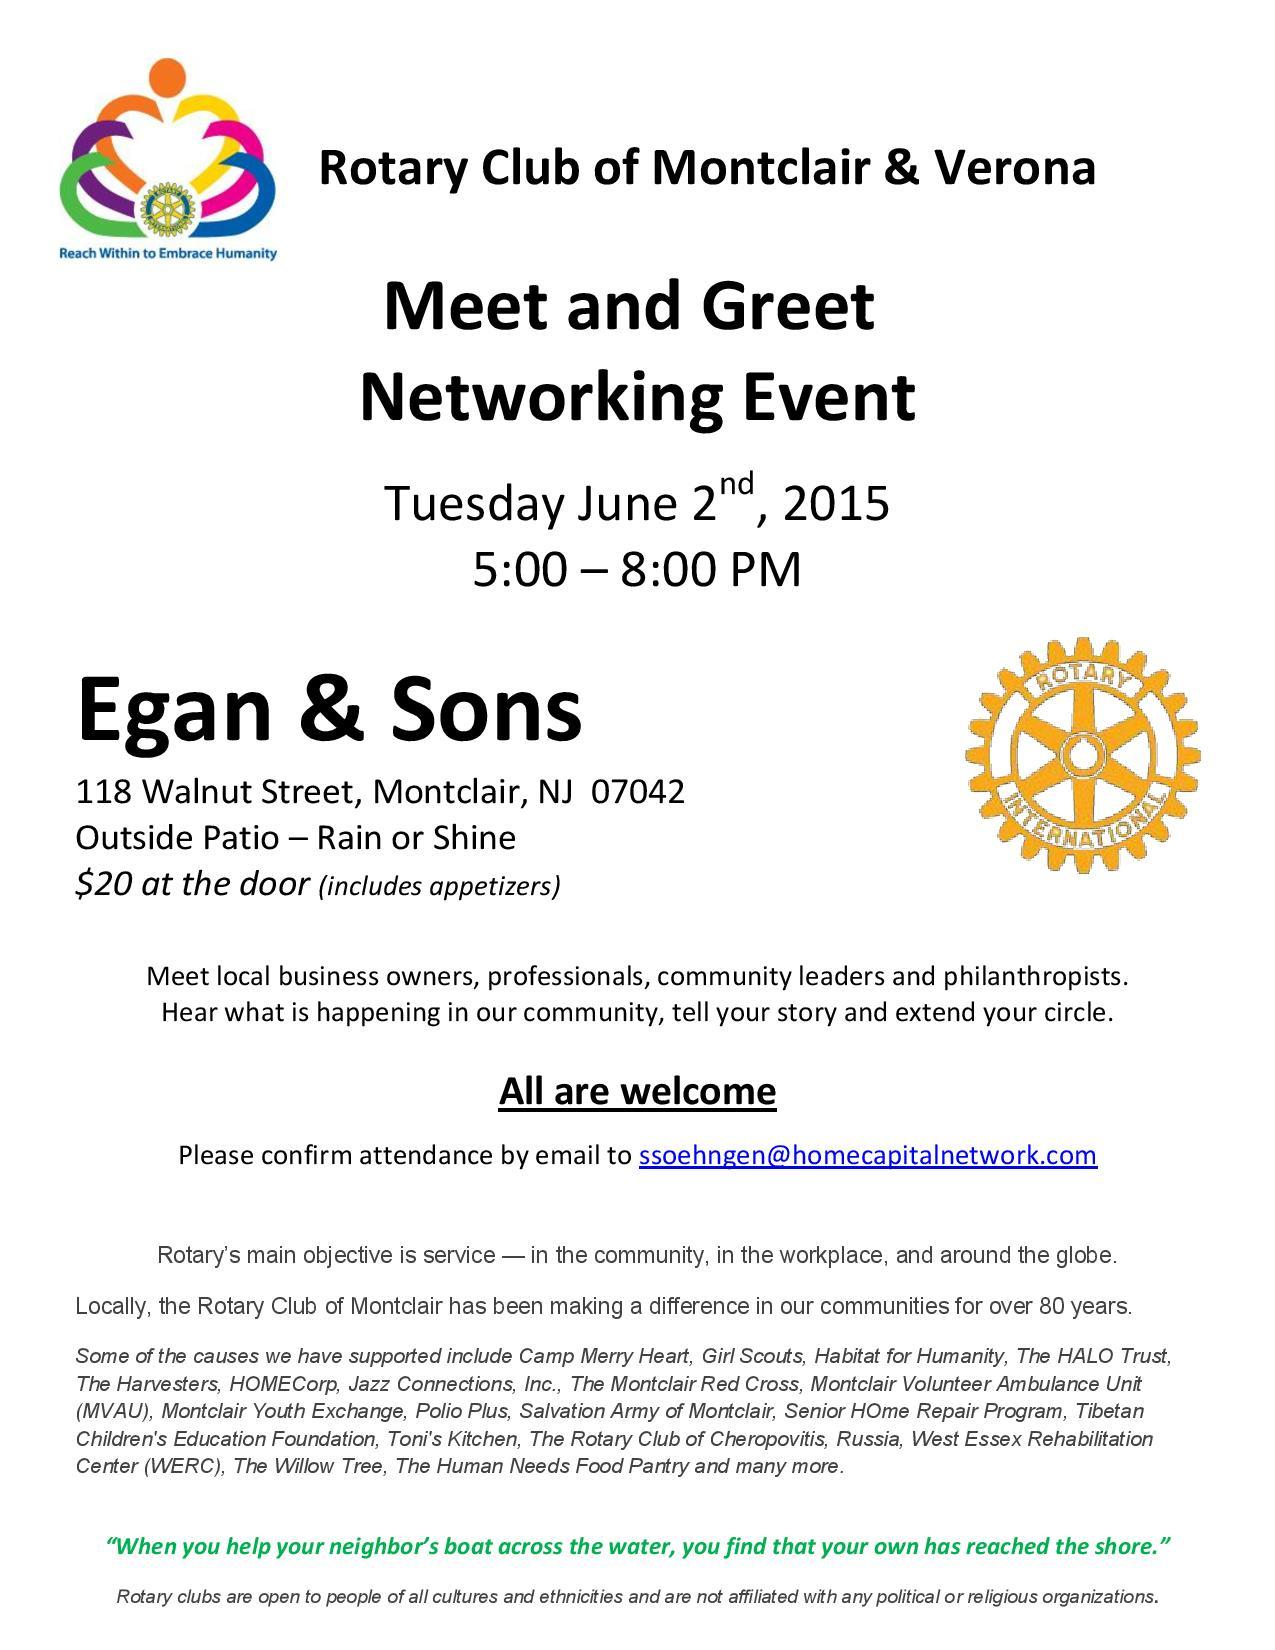 Meet And Greet Montclair Rotary Club